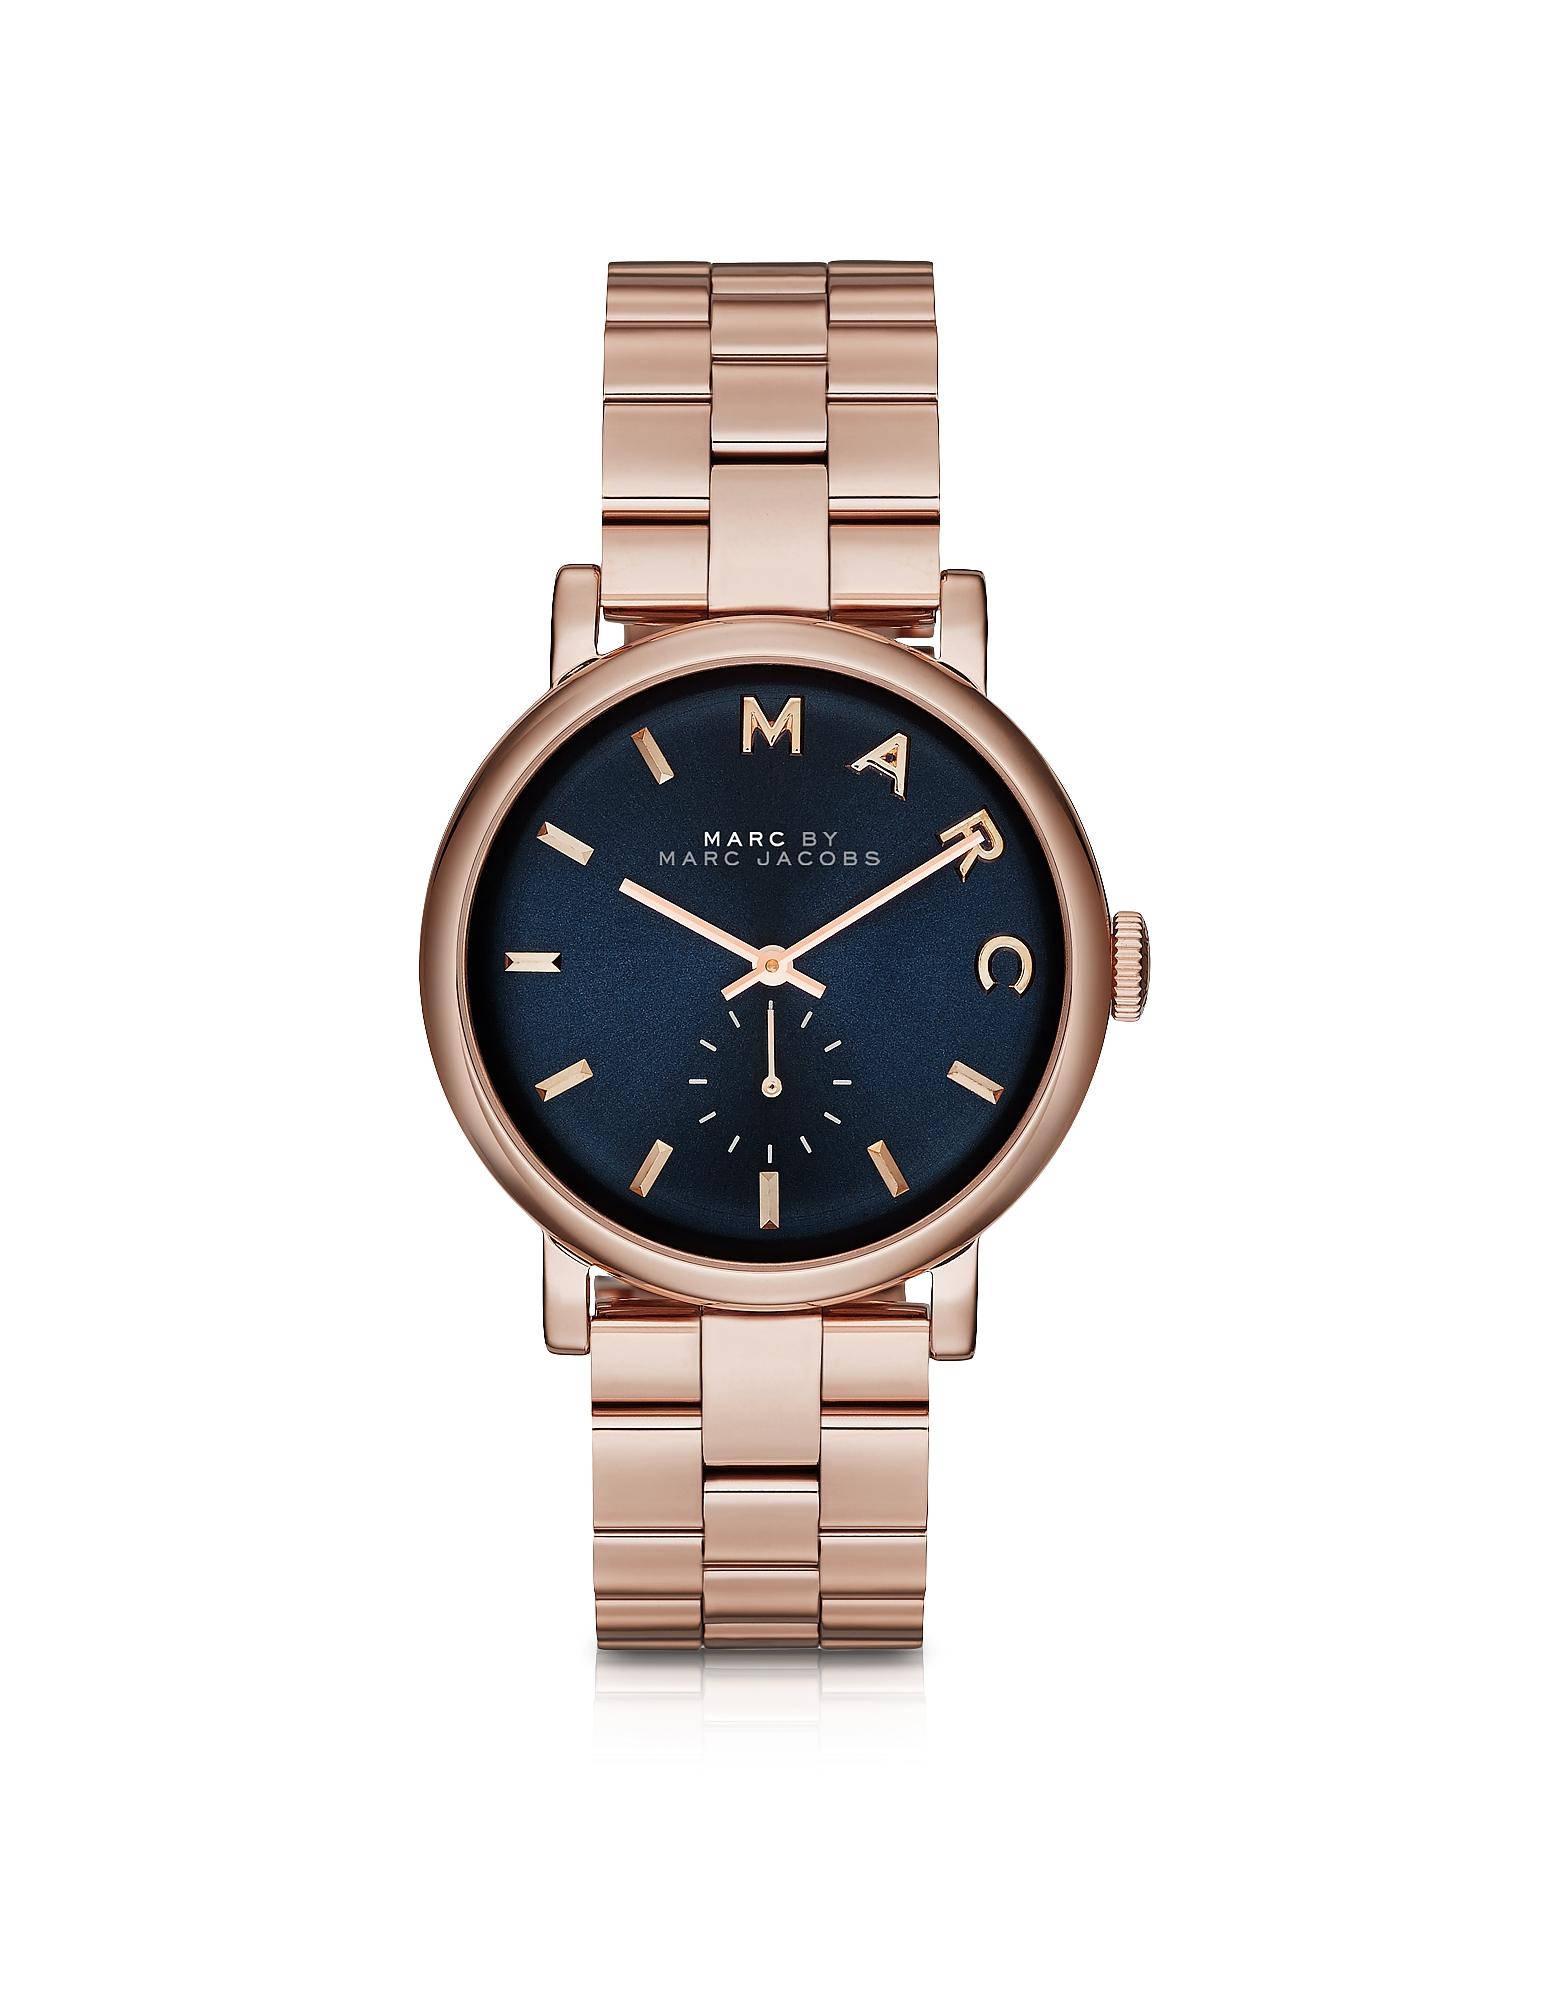 Marc by Marc Jacobs Women's Watches, Baker Bracelet 36MM Navy Blue Dial Women's Watch